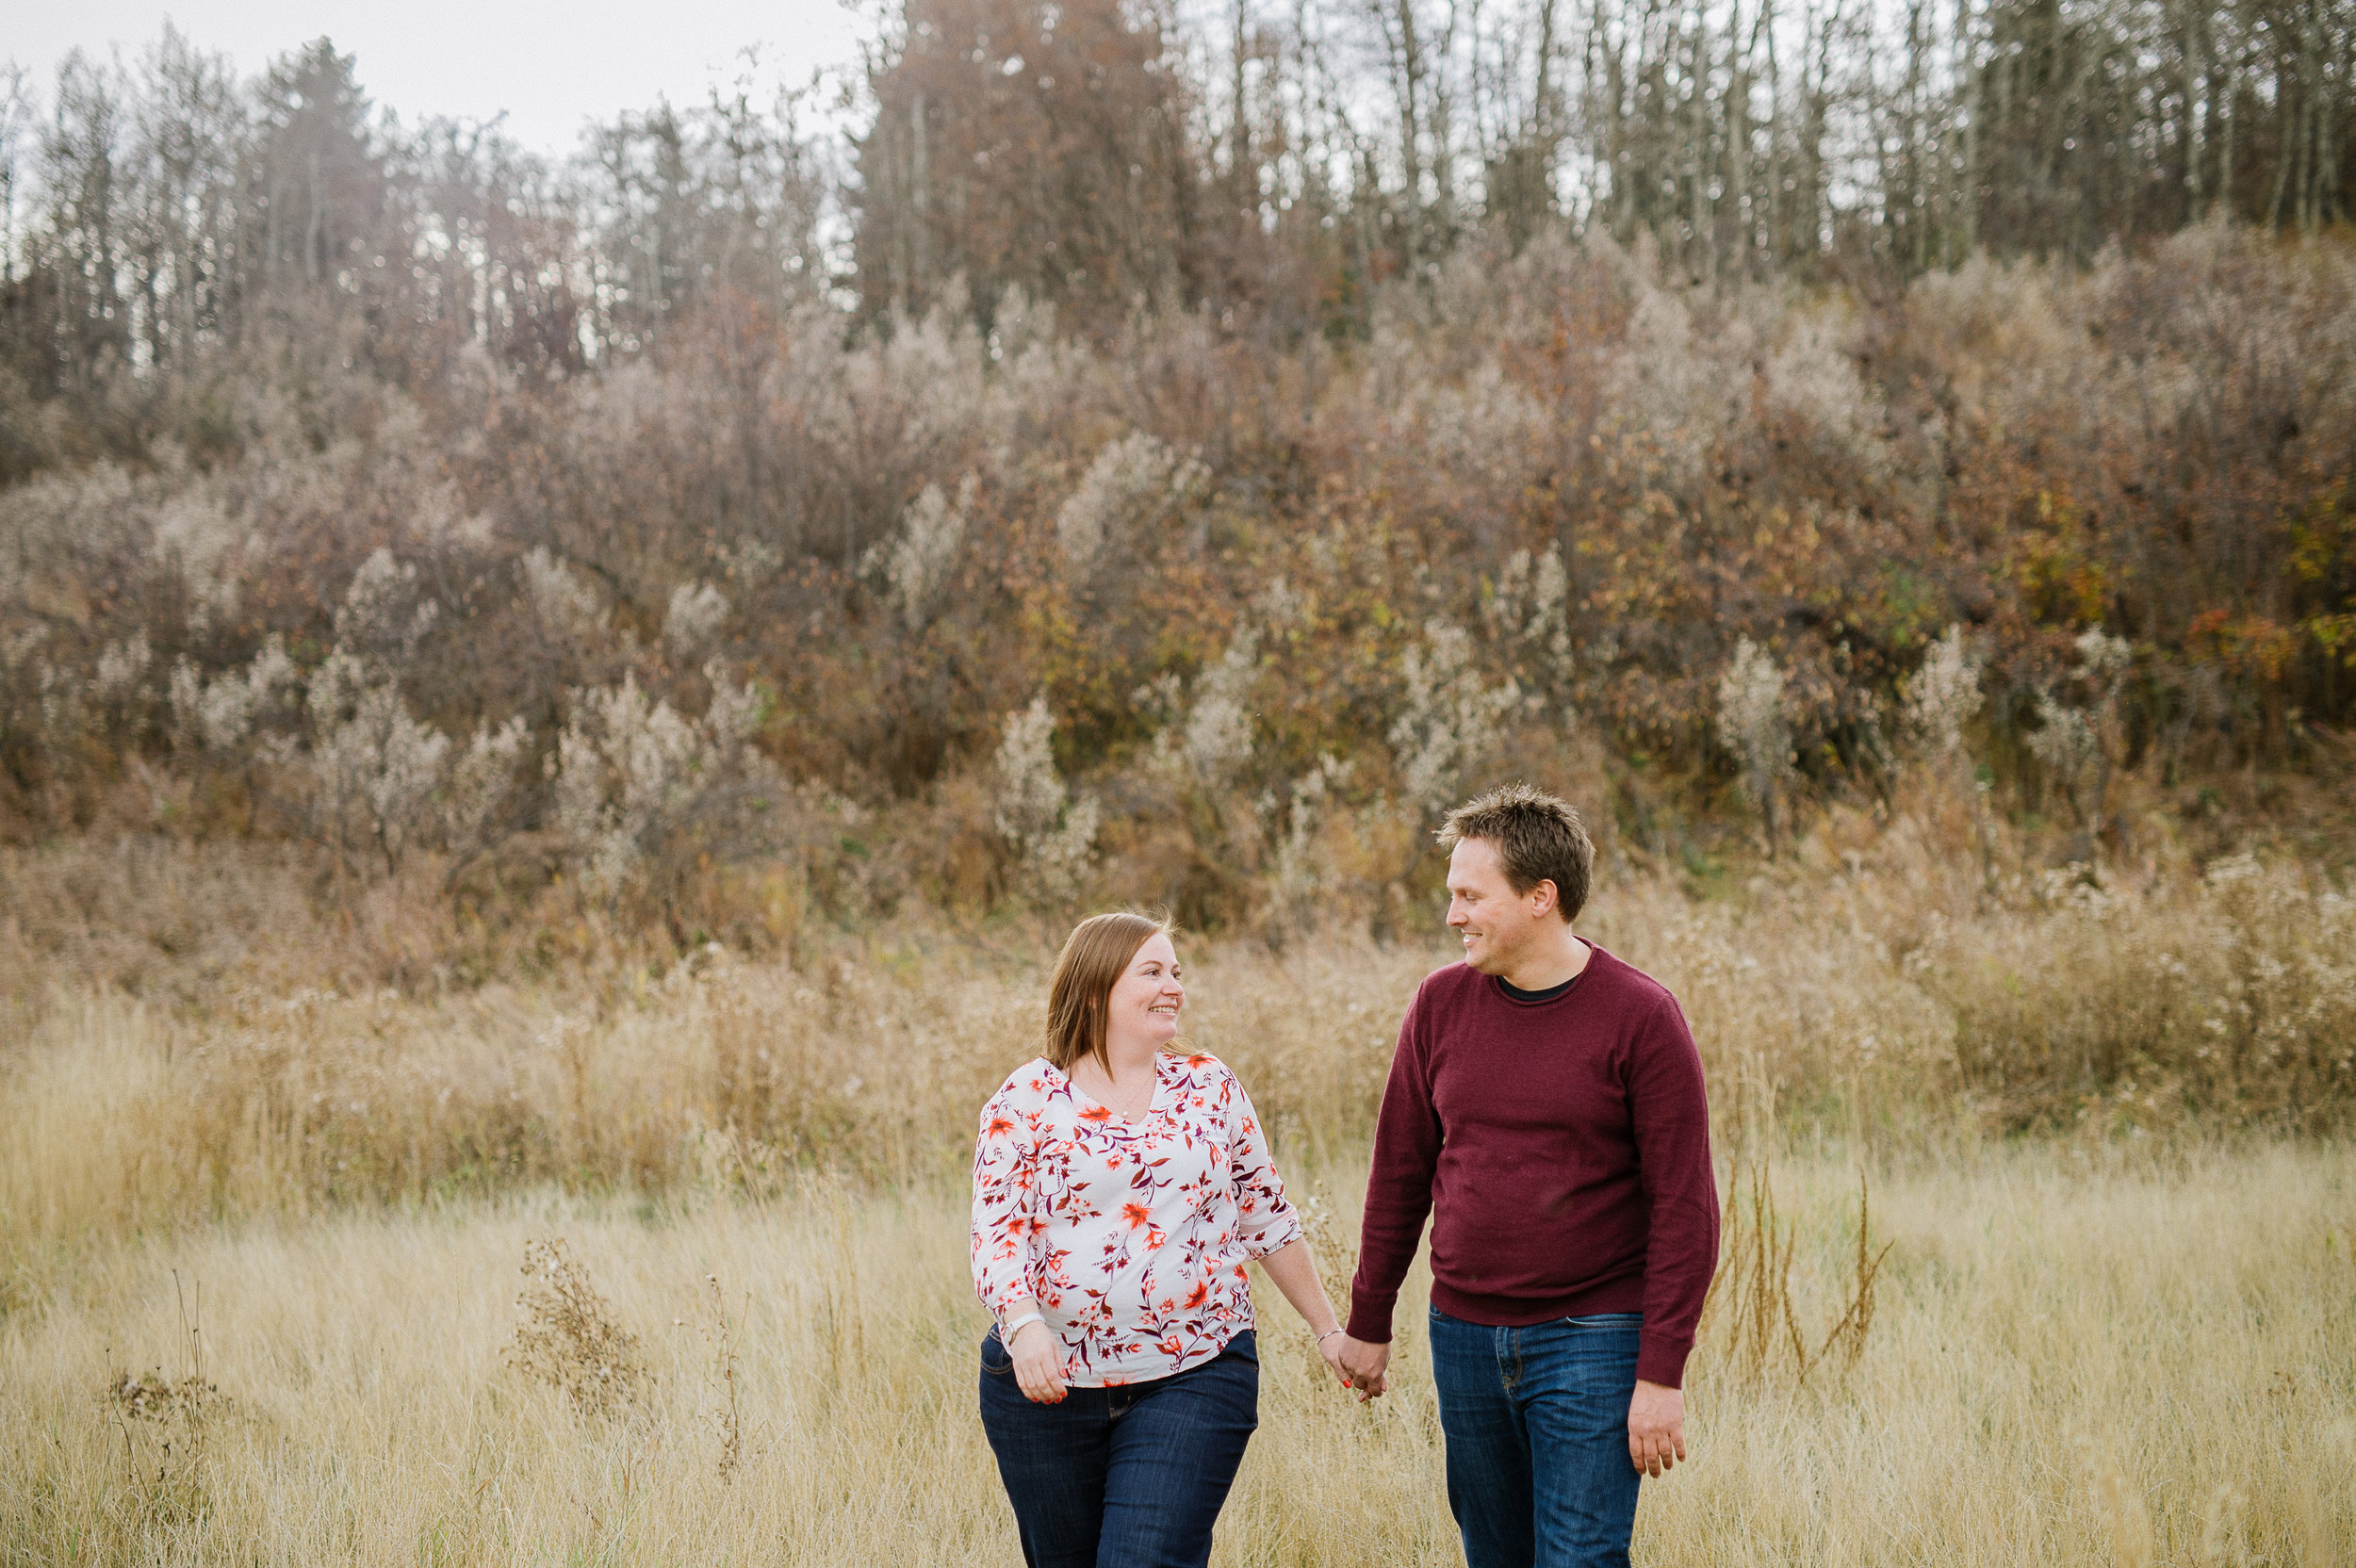 Calgary_Wedding_Photography_Amanada_Marc_Engagements_2017_HR 0006.jpg